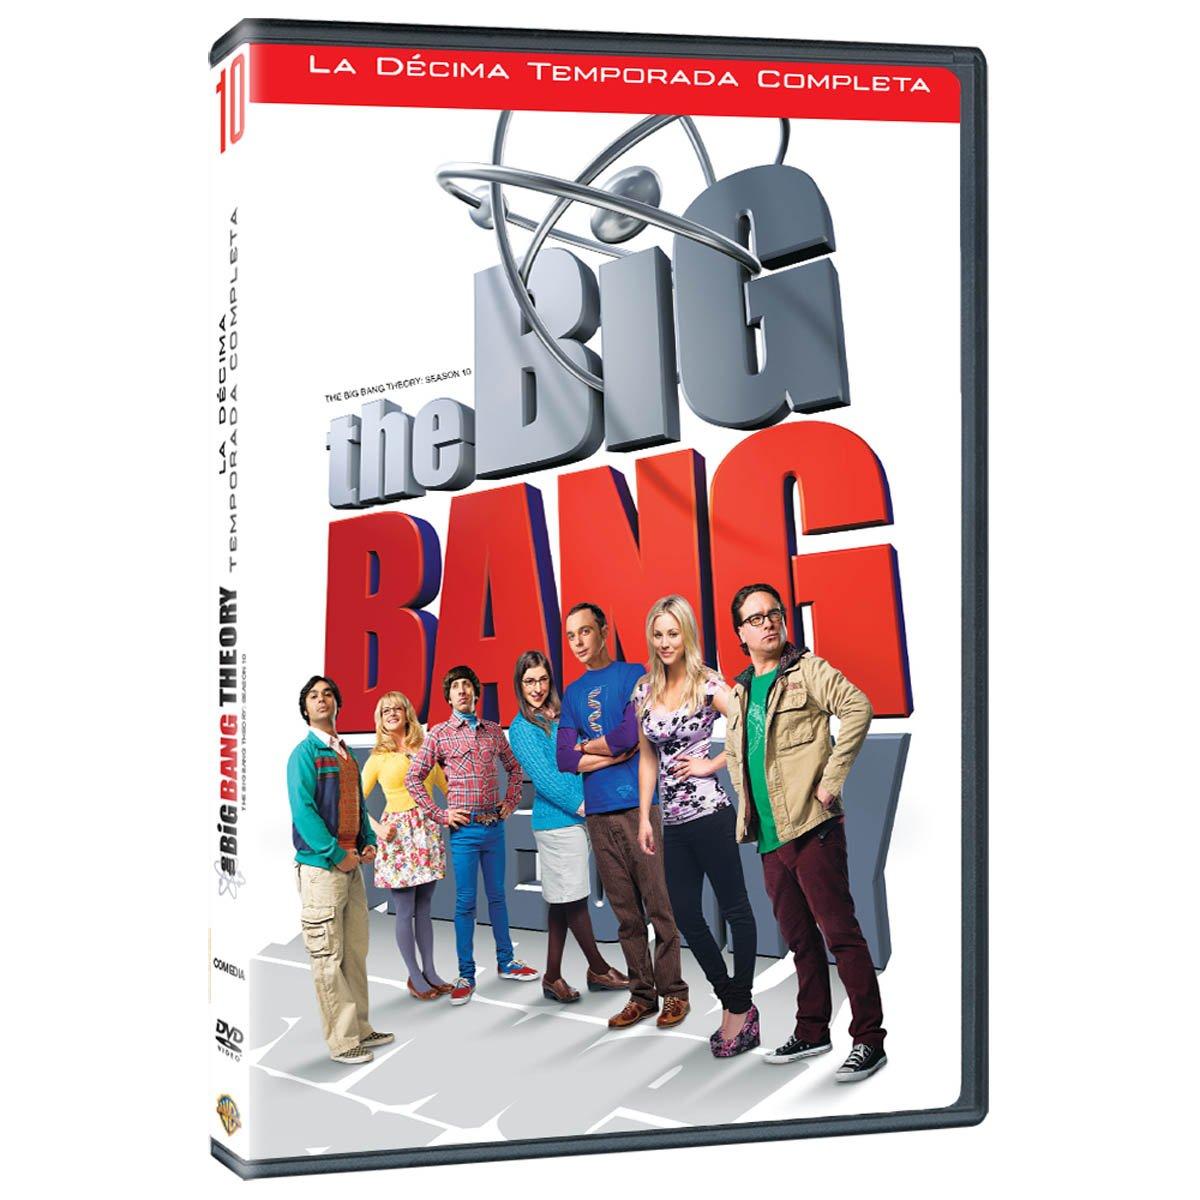 Dvd The Big Bang Theory Temporada 10 Sears Com Mx Me Entiende  # Muebles Big Bang Theory